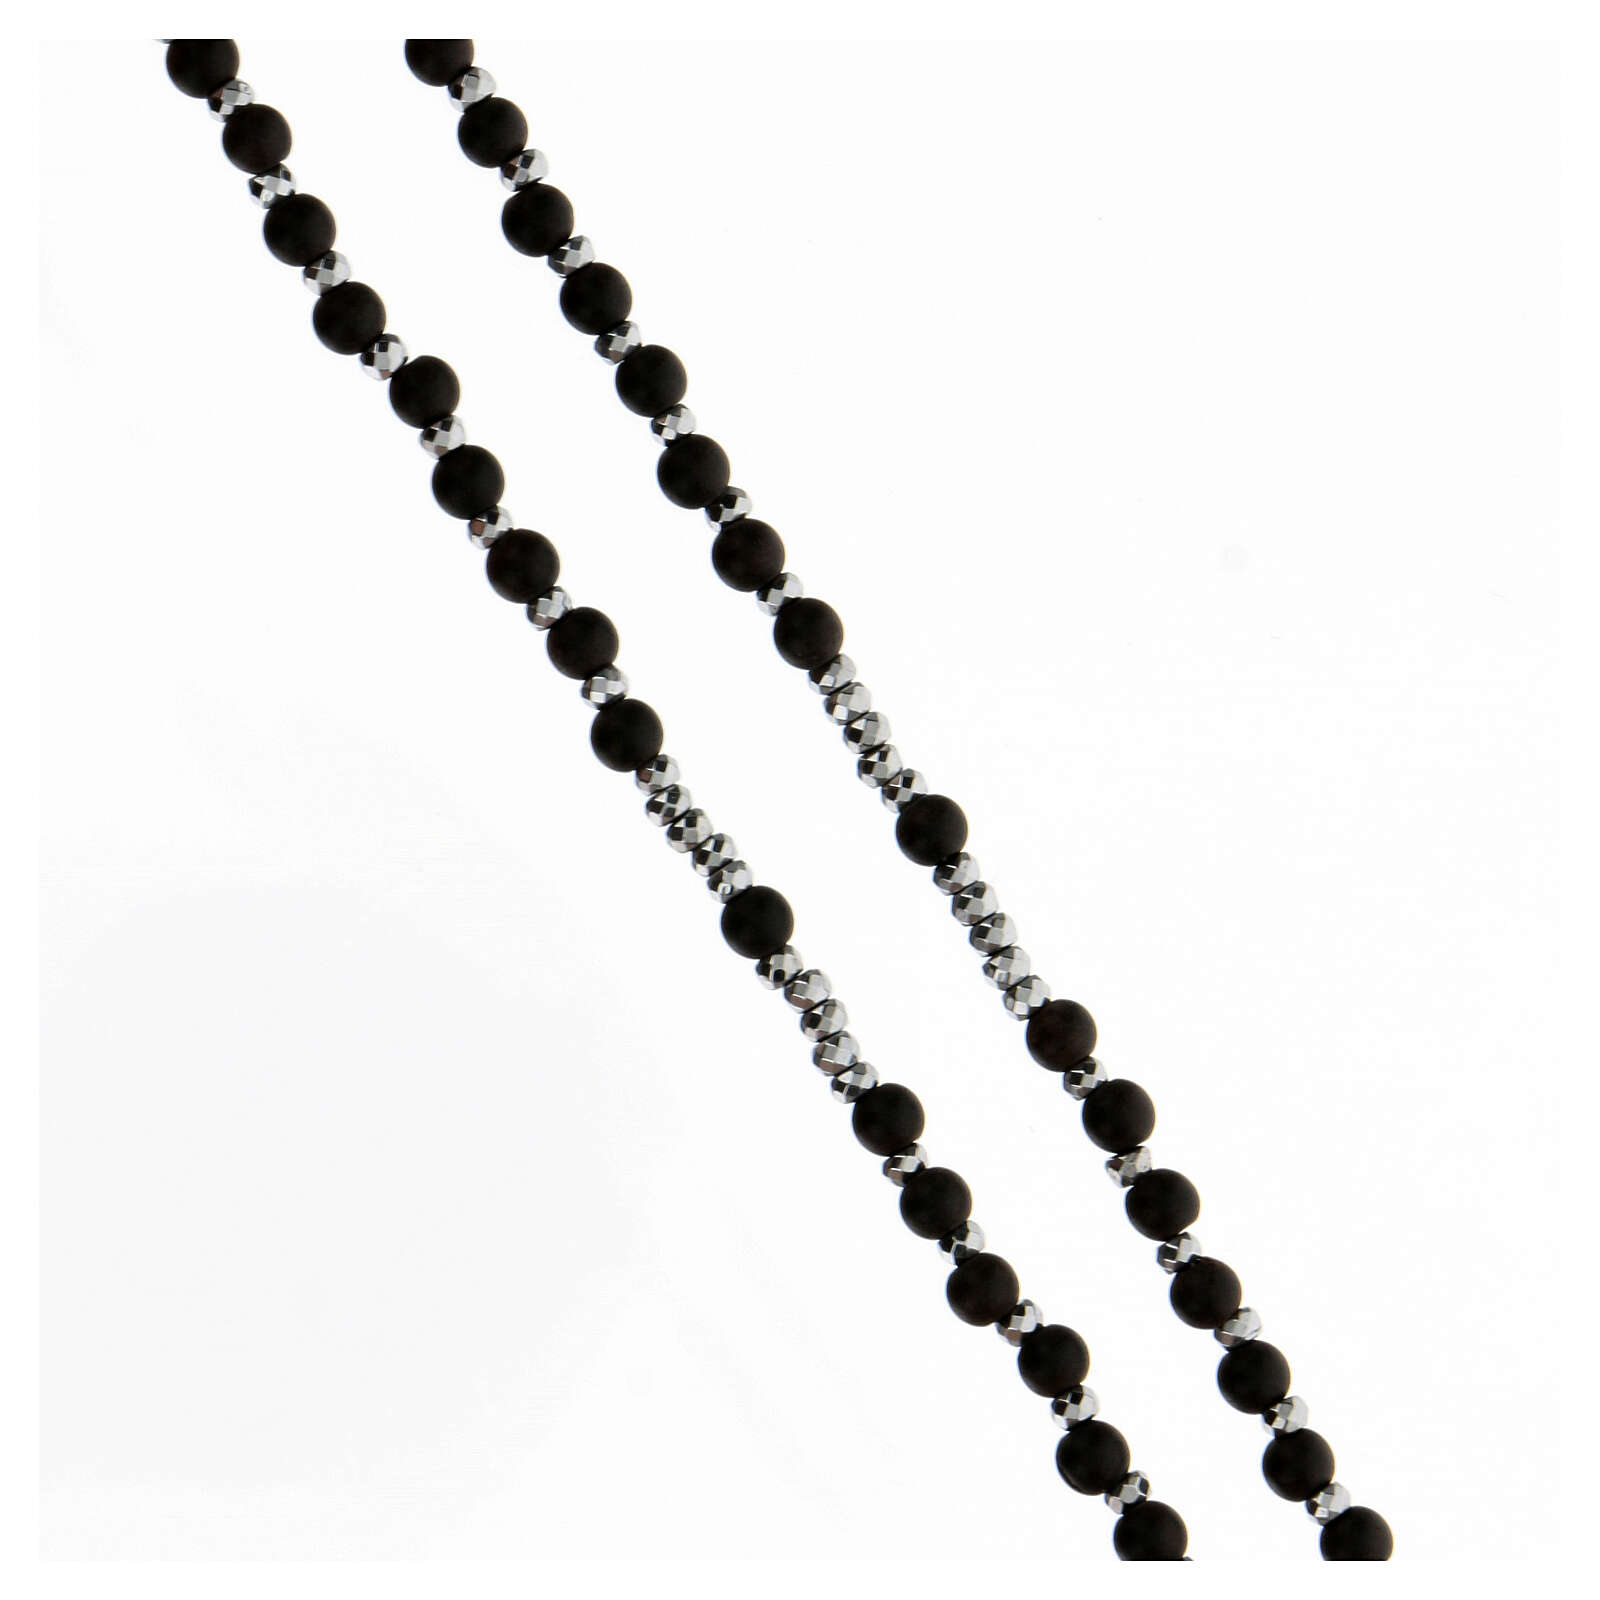 Rosario Medalla Milagrosa granos madera 3 mm negros bolitas hematites 4